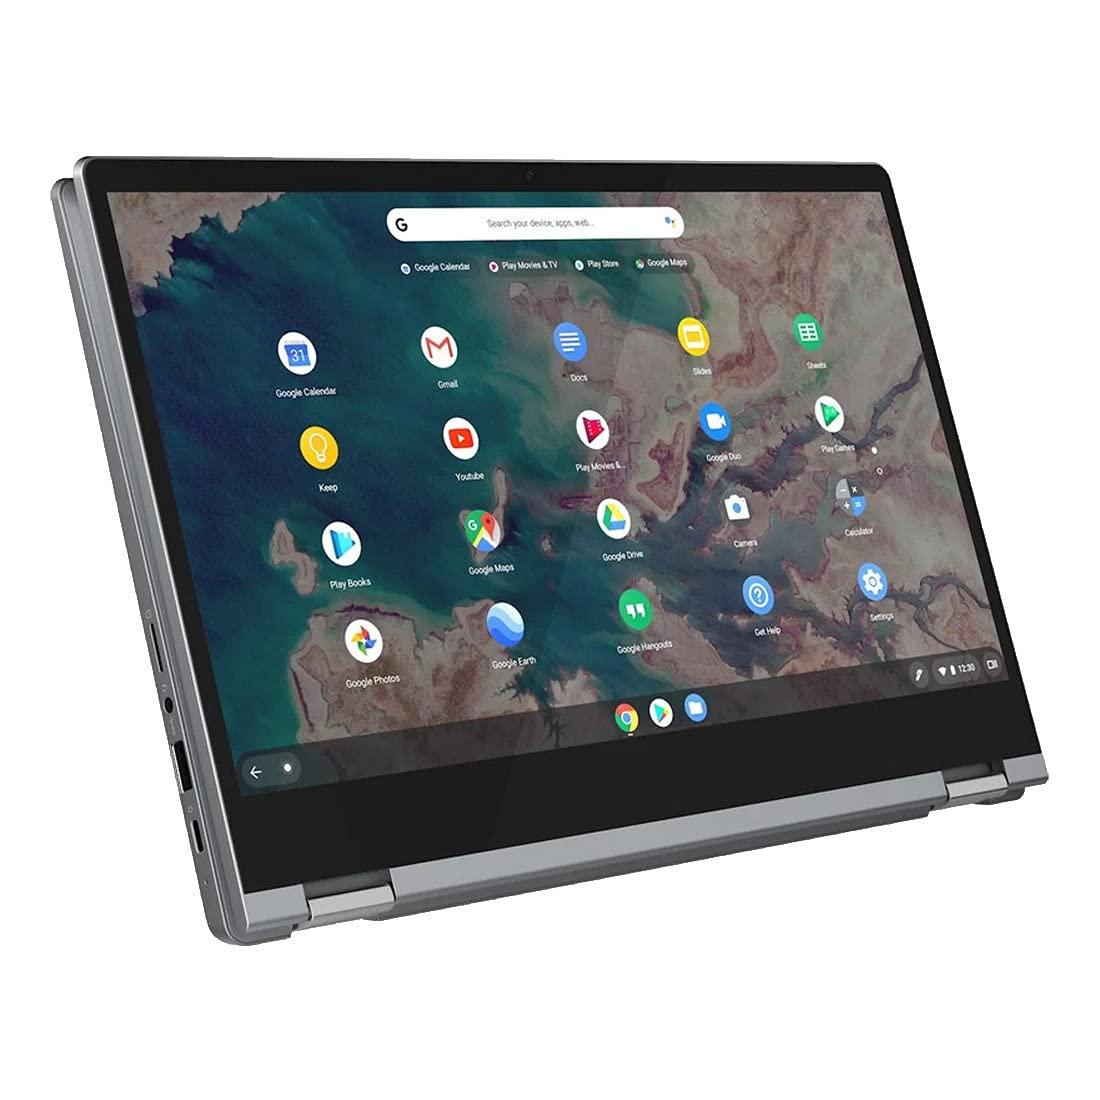 "Lenovo Chromebook Flex 5 13"" Laptop, FHD (1920 x 1080) Touch Display, Intel Core i3-10110U Processor, 4GB DDR4 Onboard RAM, 64GB eMMC, Intel Integrated Graphics, Chrome OS, 82B80006UX, Graphite Grey"